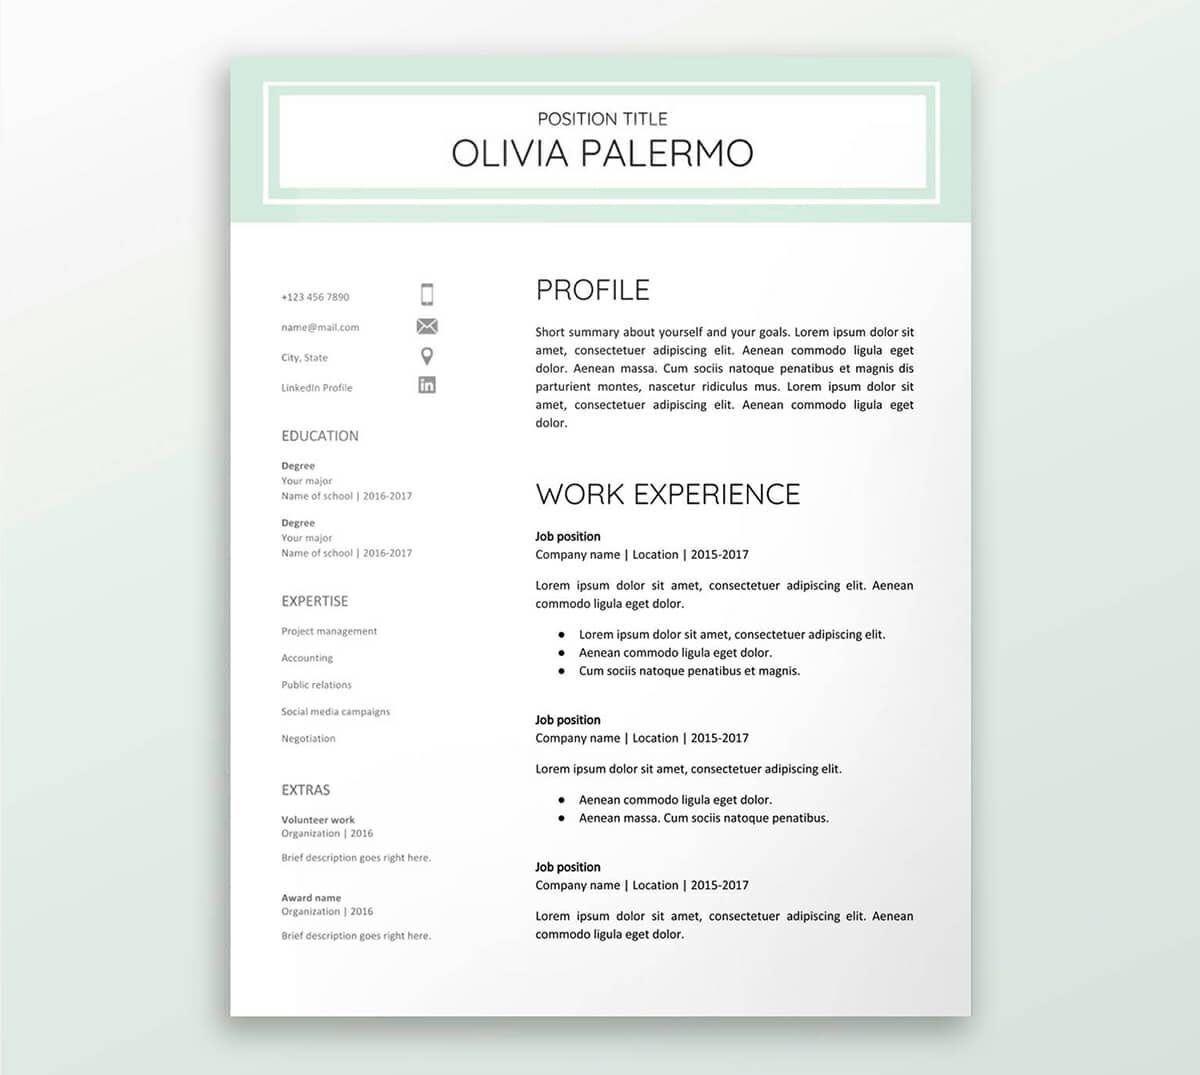 004 Astounding Entry Level Resume Template Google Doc High Definition  DocsFull